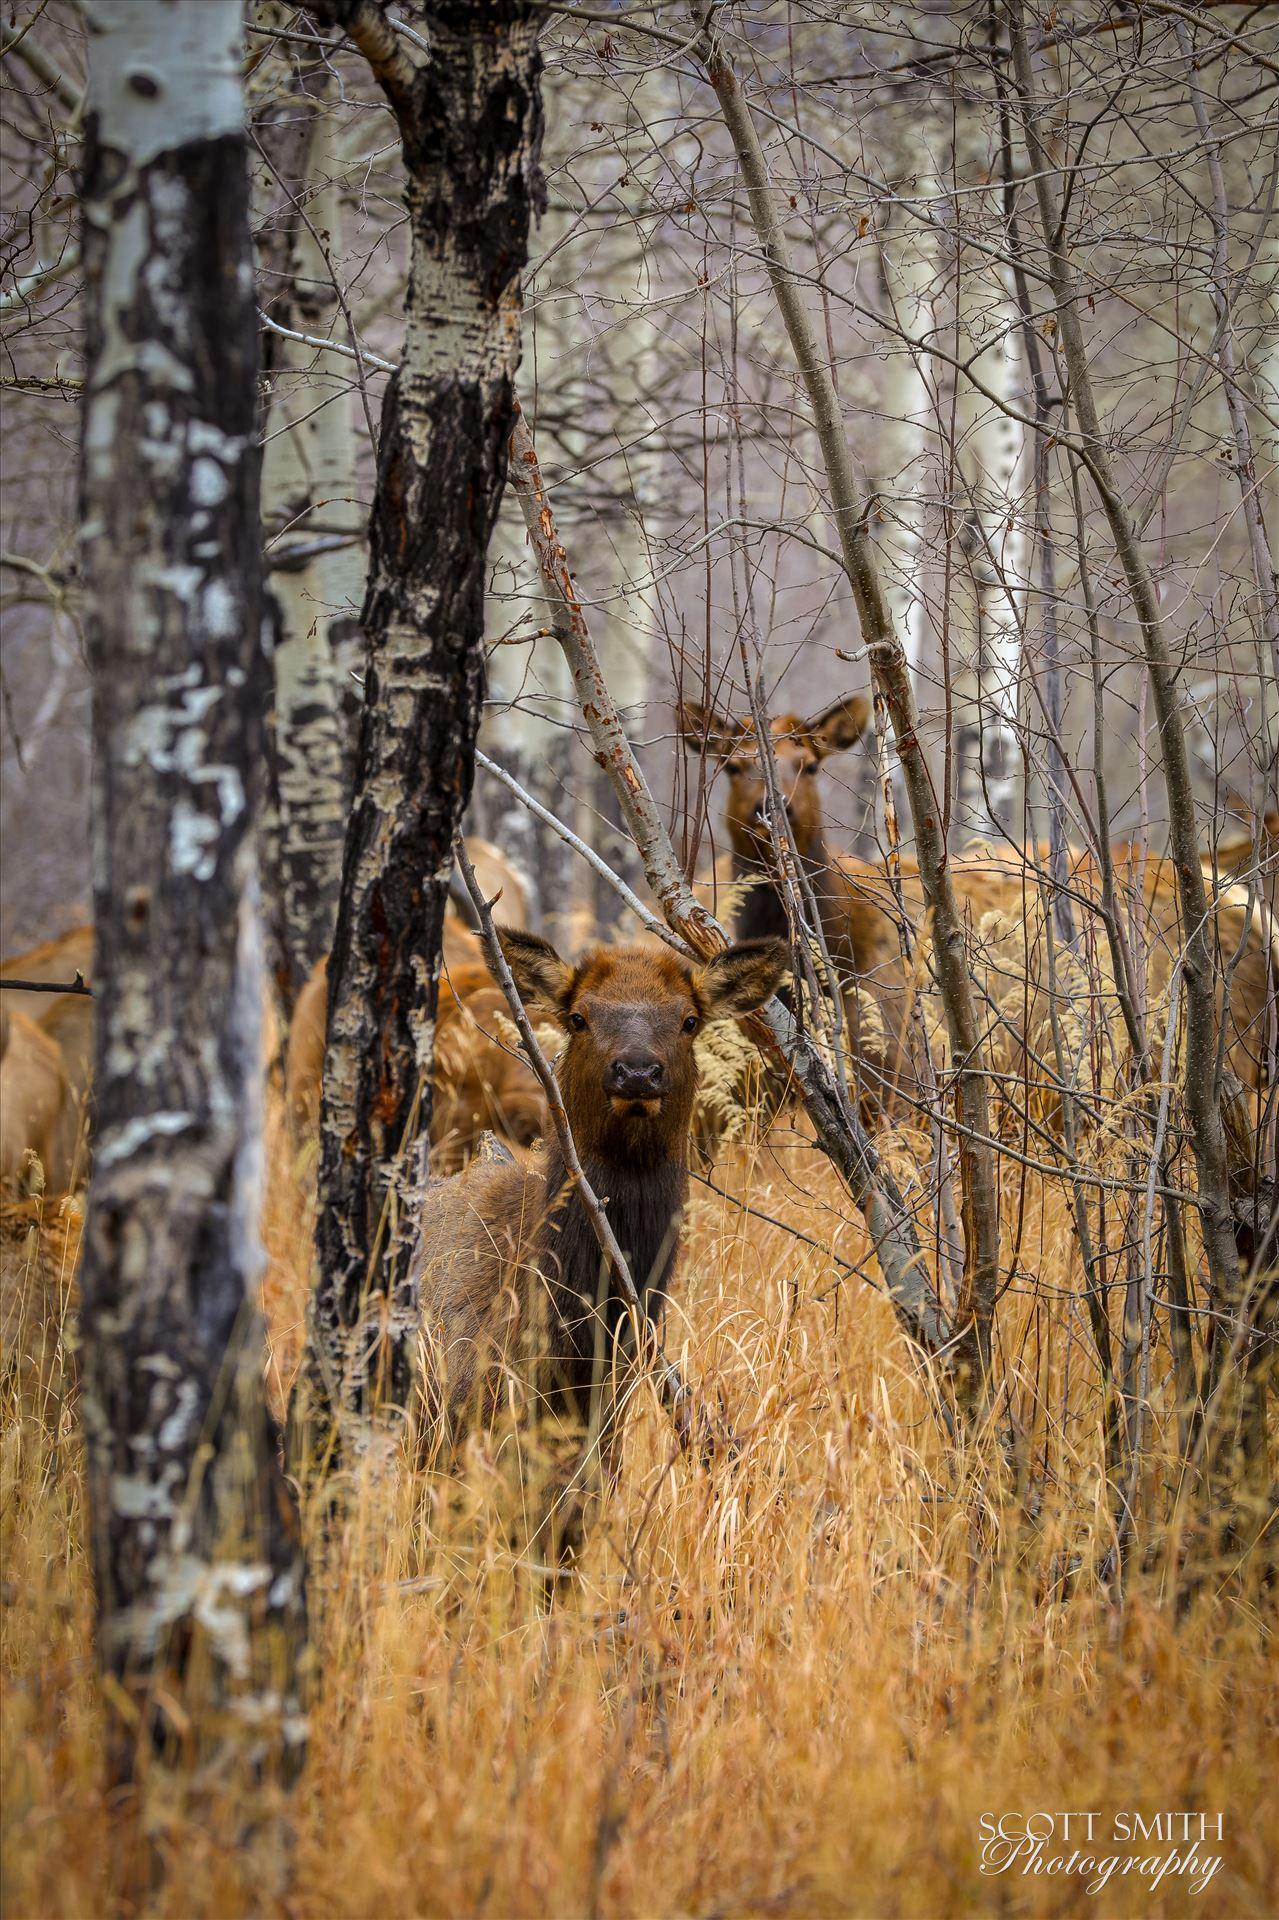 Sunday Elk No 02 - A heard of Elk near the entrance to Rocky Mountain National Park, Estes Park, Colorado. by D Scott Smith